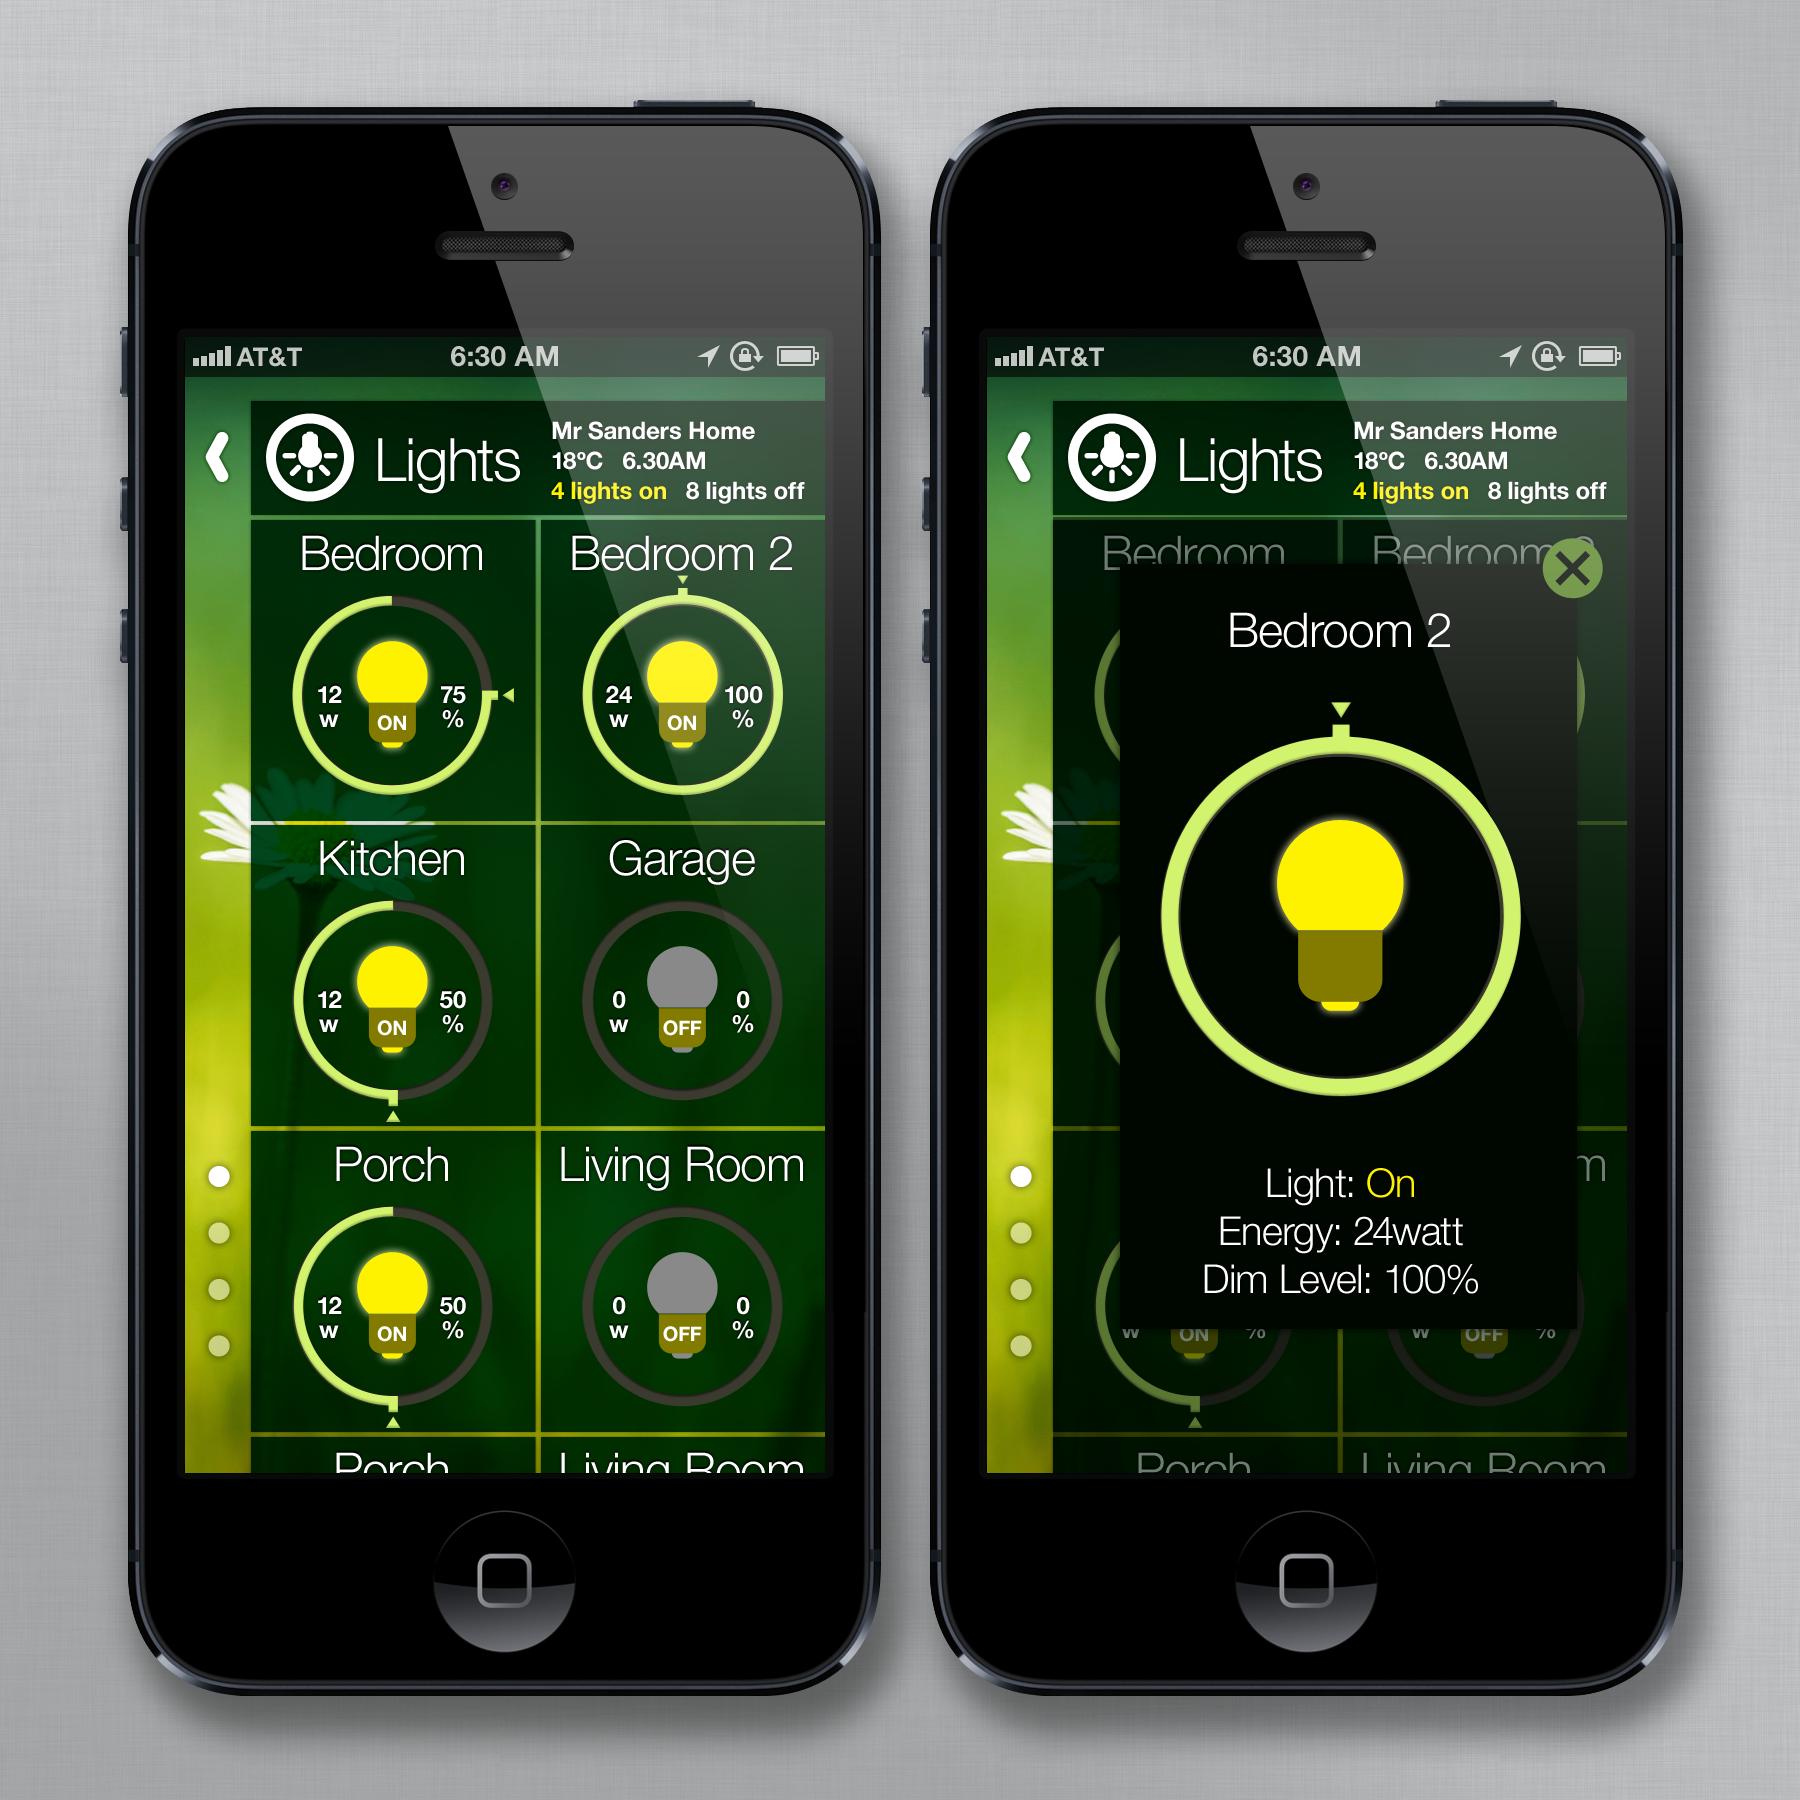 incontrol design contest design home automation app to control lights mobile app design 39 - Home Automation Design